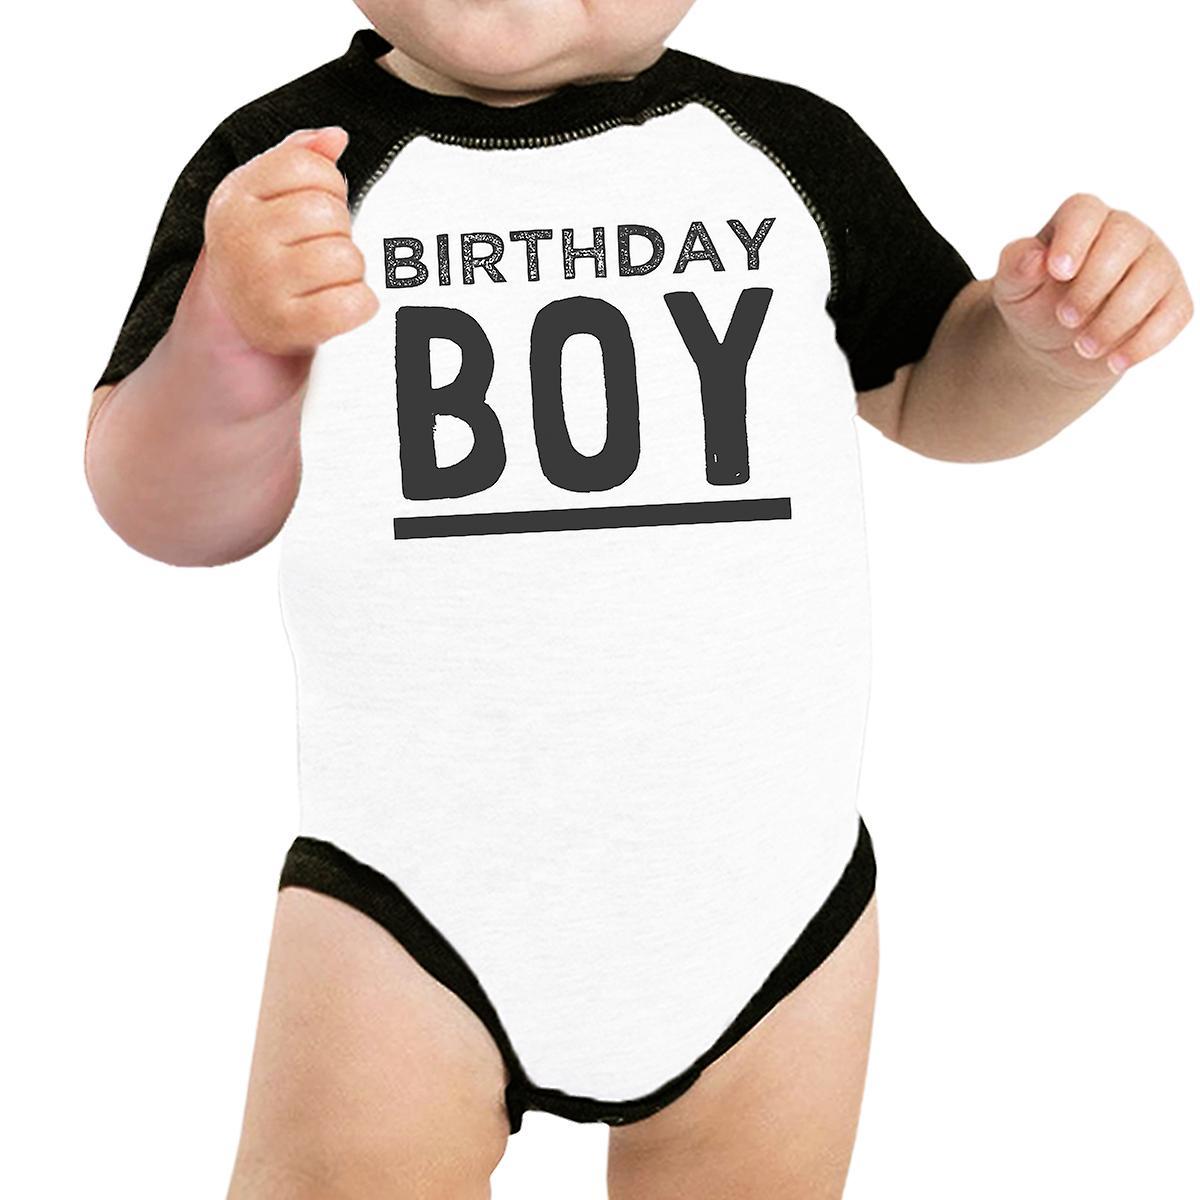 Baby Boy Baseball Onesie Black Cute Baby Birthday Gift T-Shirt Idea